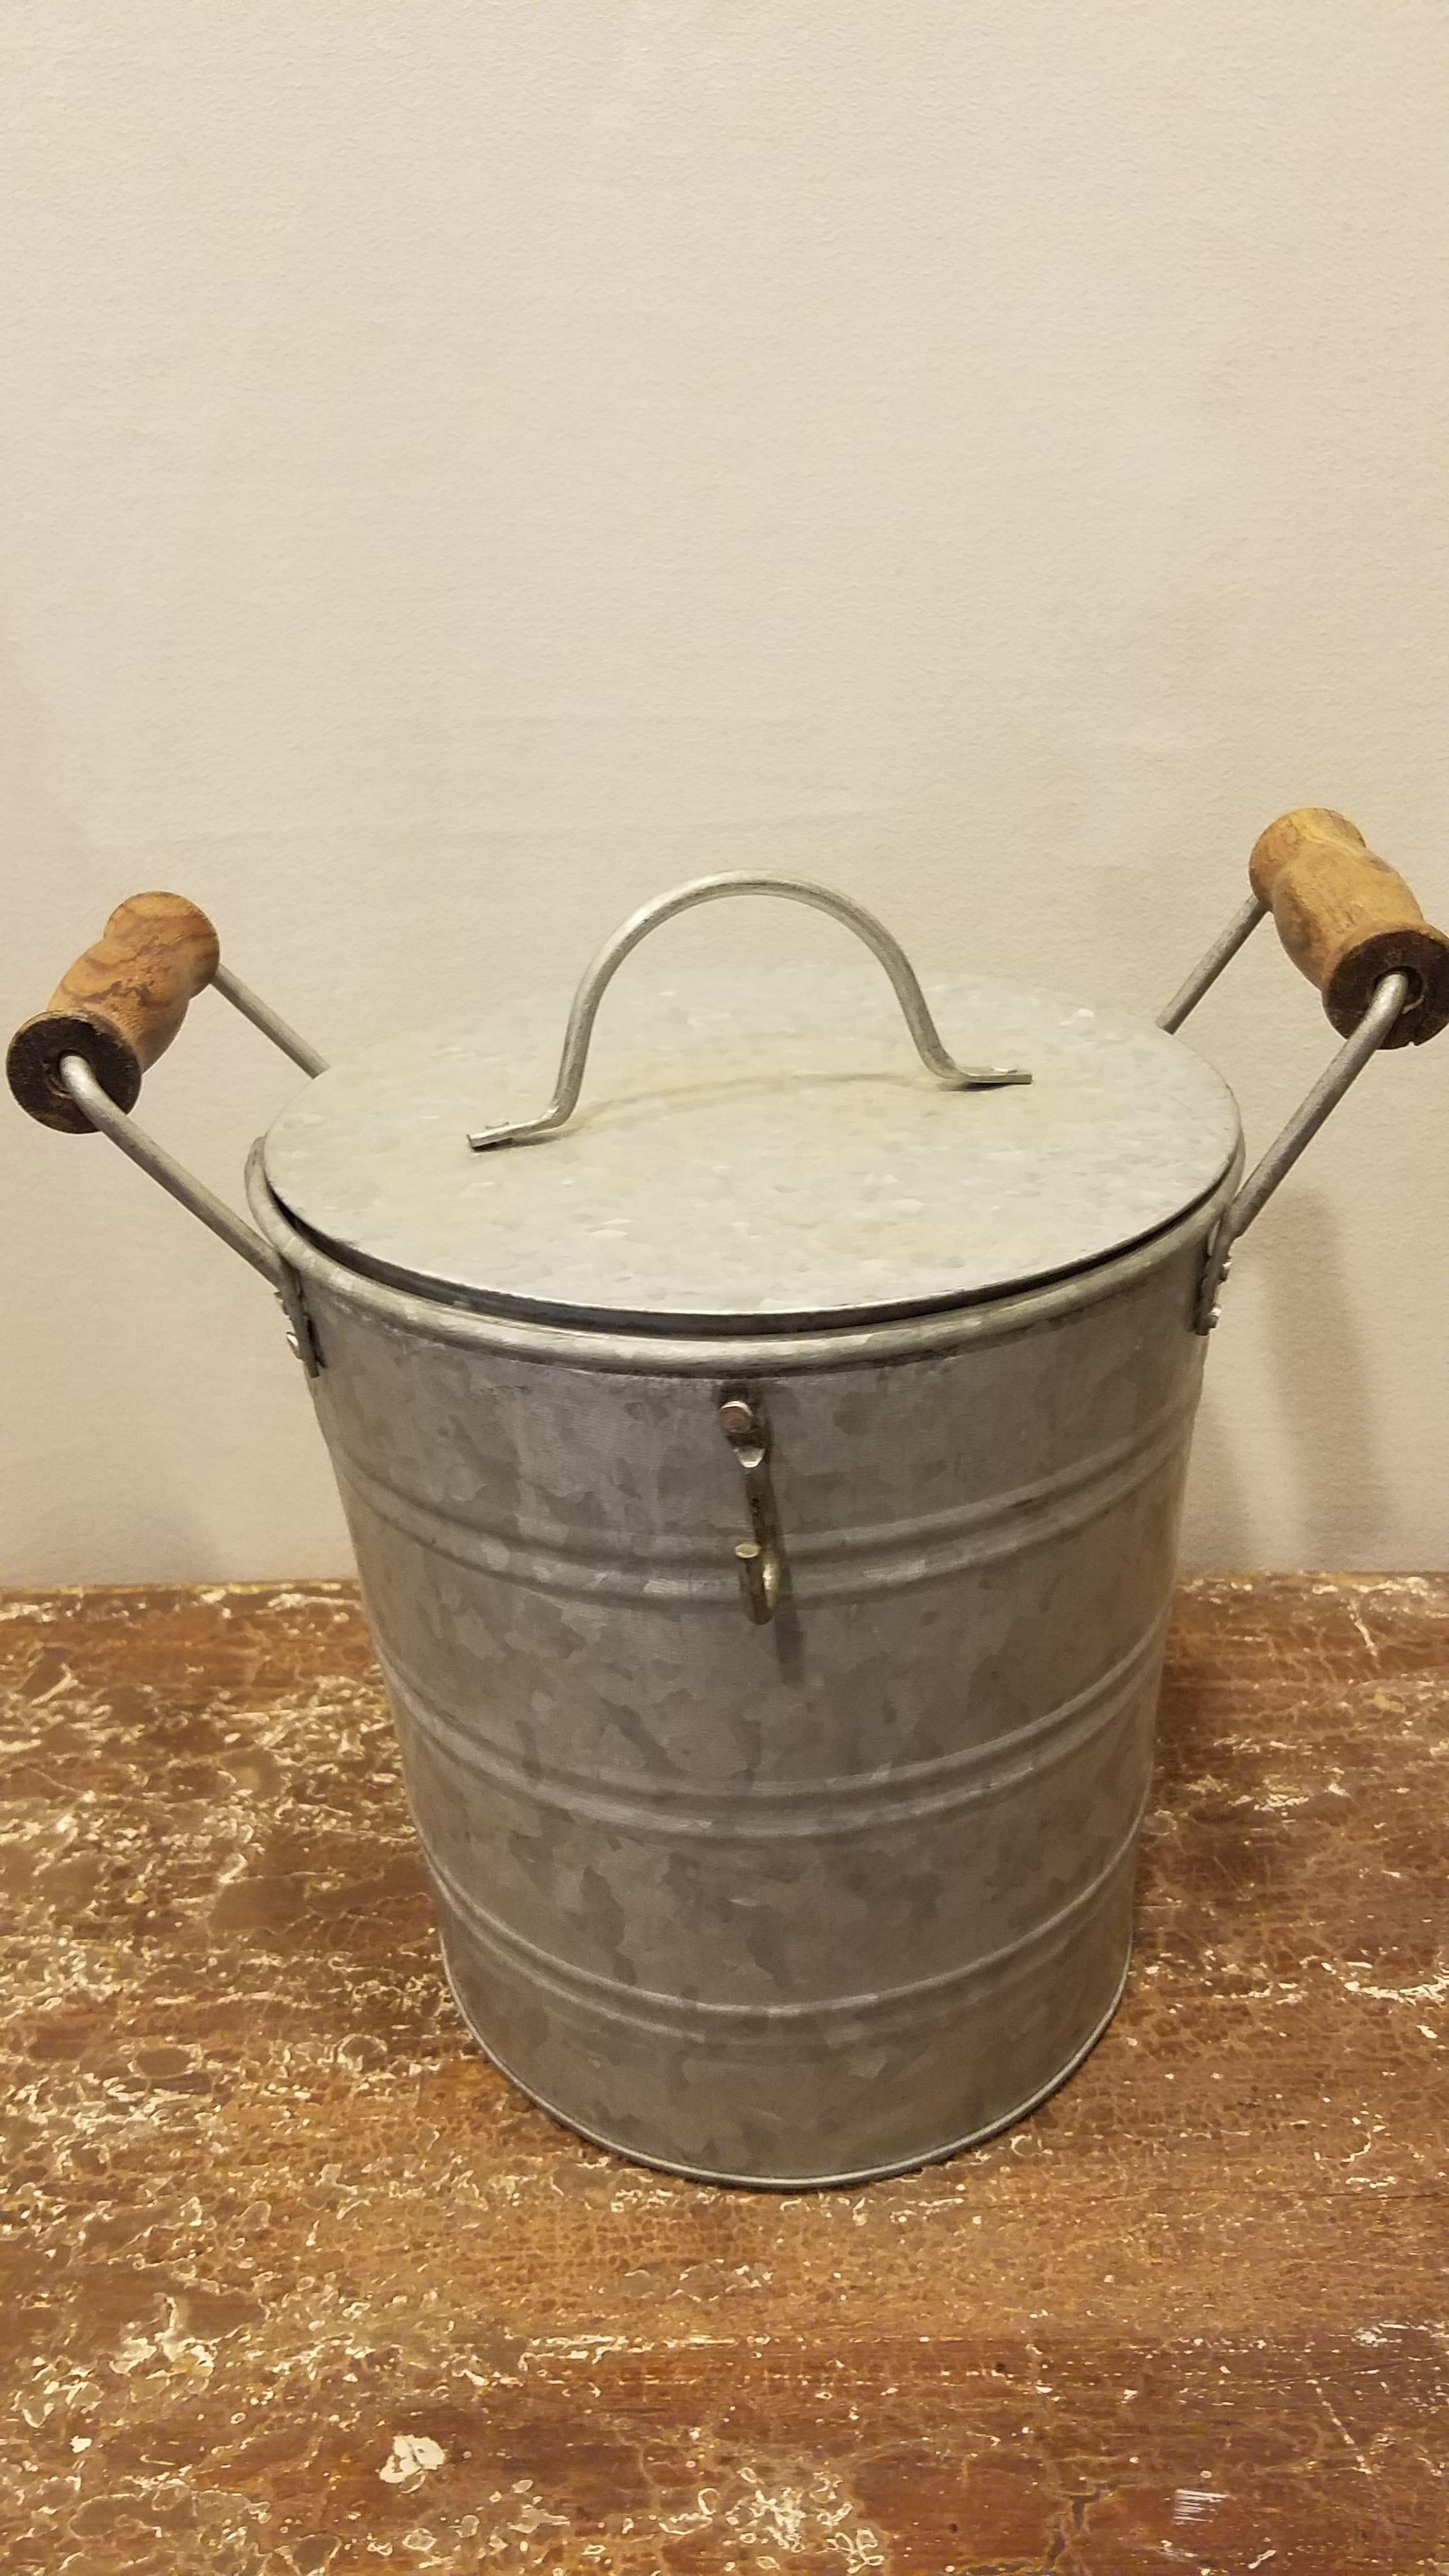 Bucket - Galvanized Ice Cooler